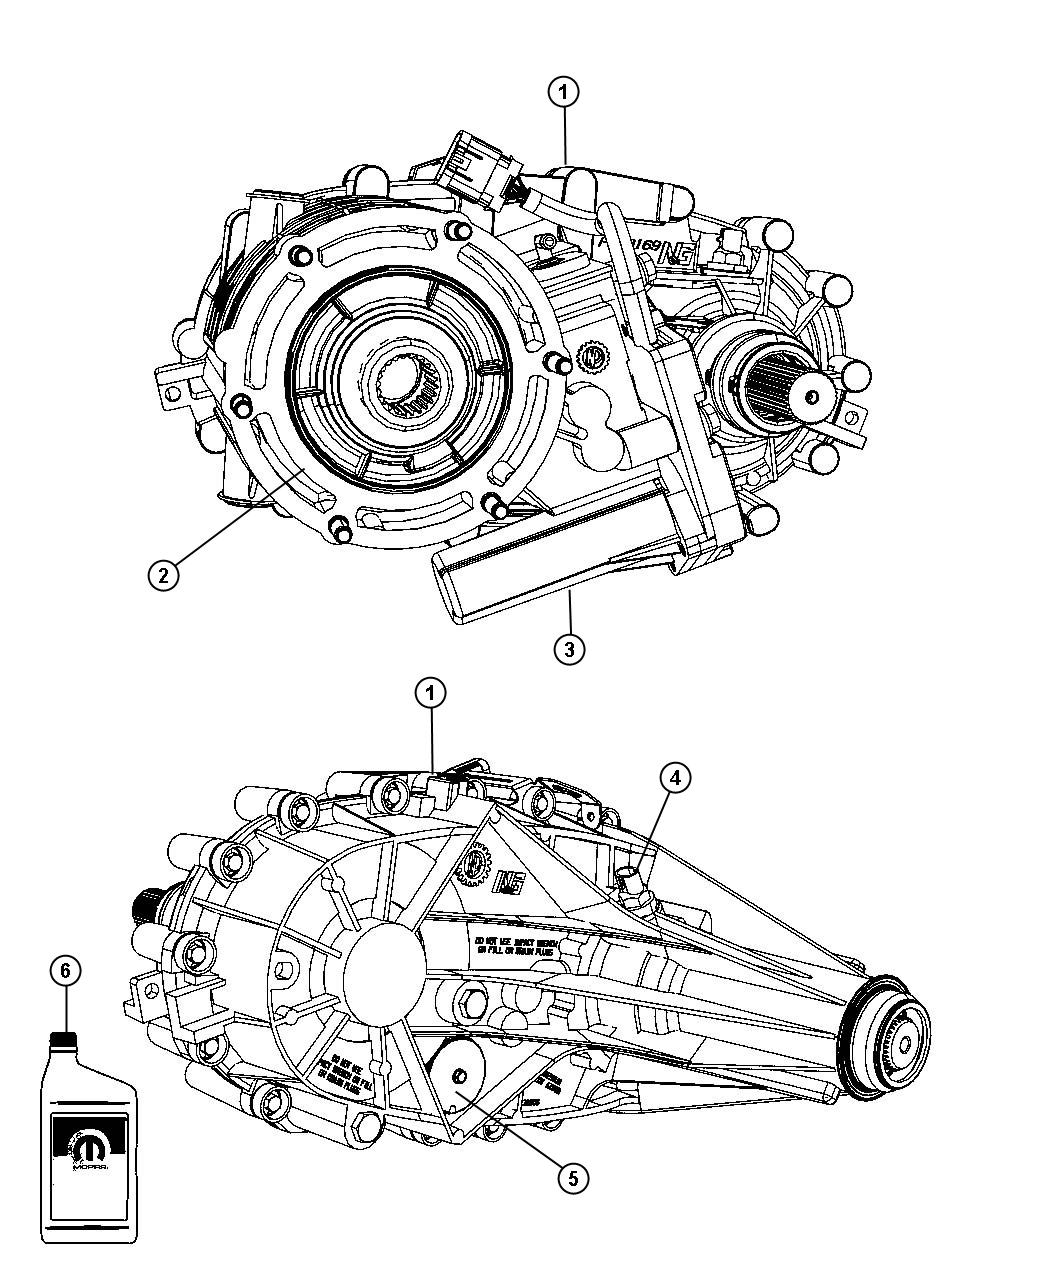 2010 Dodge Ram 1500 Gear motor. Transfer case. Shift